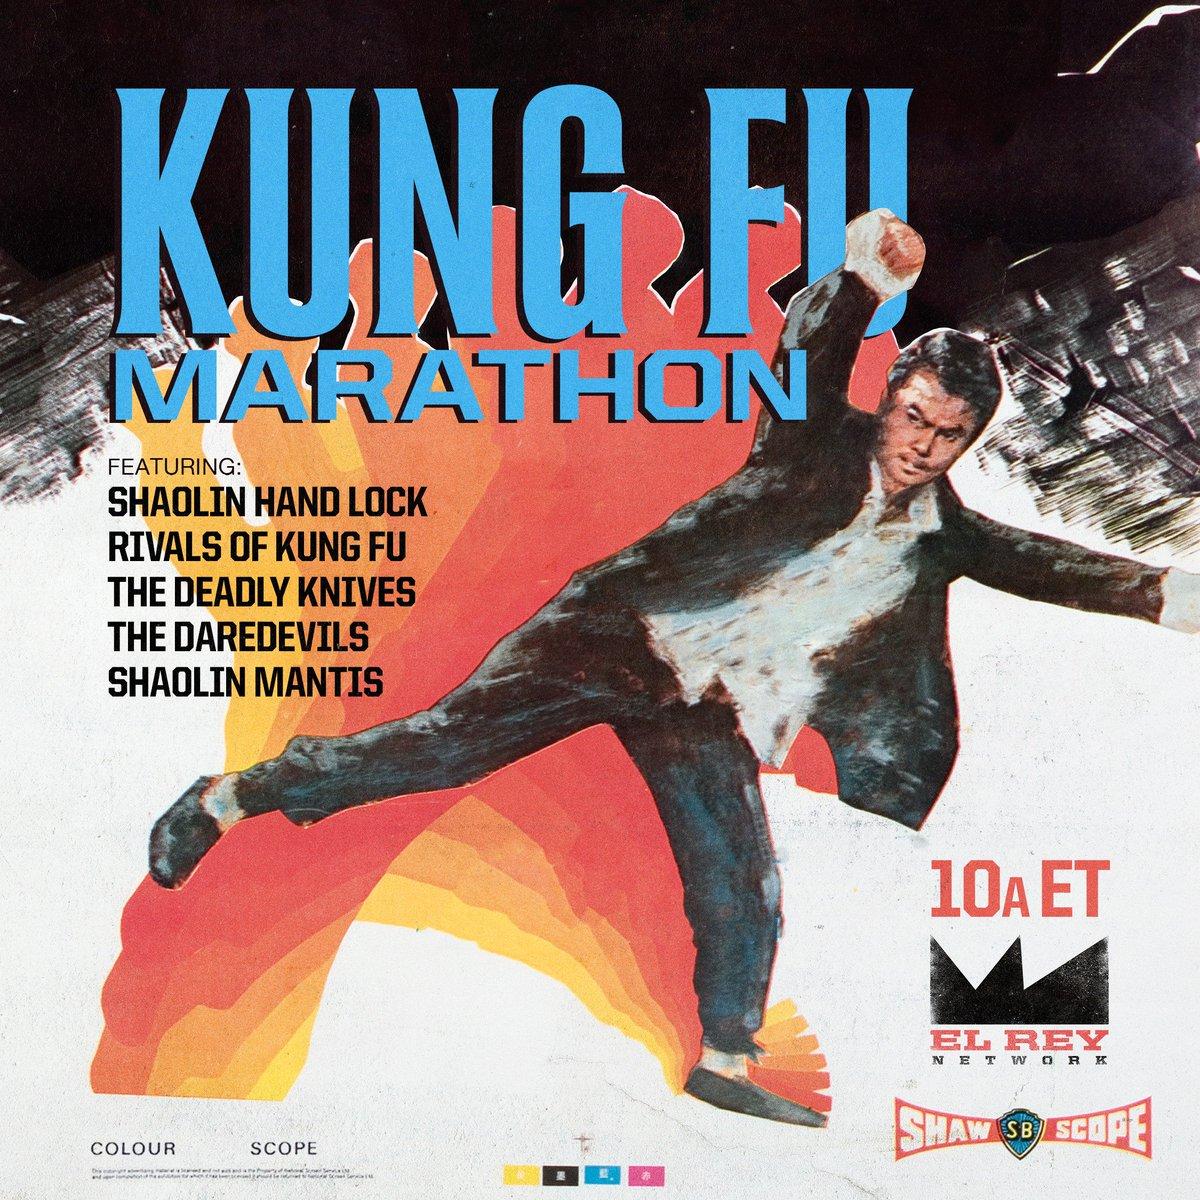 SUNDAY! The Kung Fu Marathon returns with the Shaolin Hand Lock leading the way! 10a ET on @Elreynetwork! #kungfu #shawbrothers #shaolin #martialarts #kungfumoviesm#movieso#ridewithelreyvies